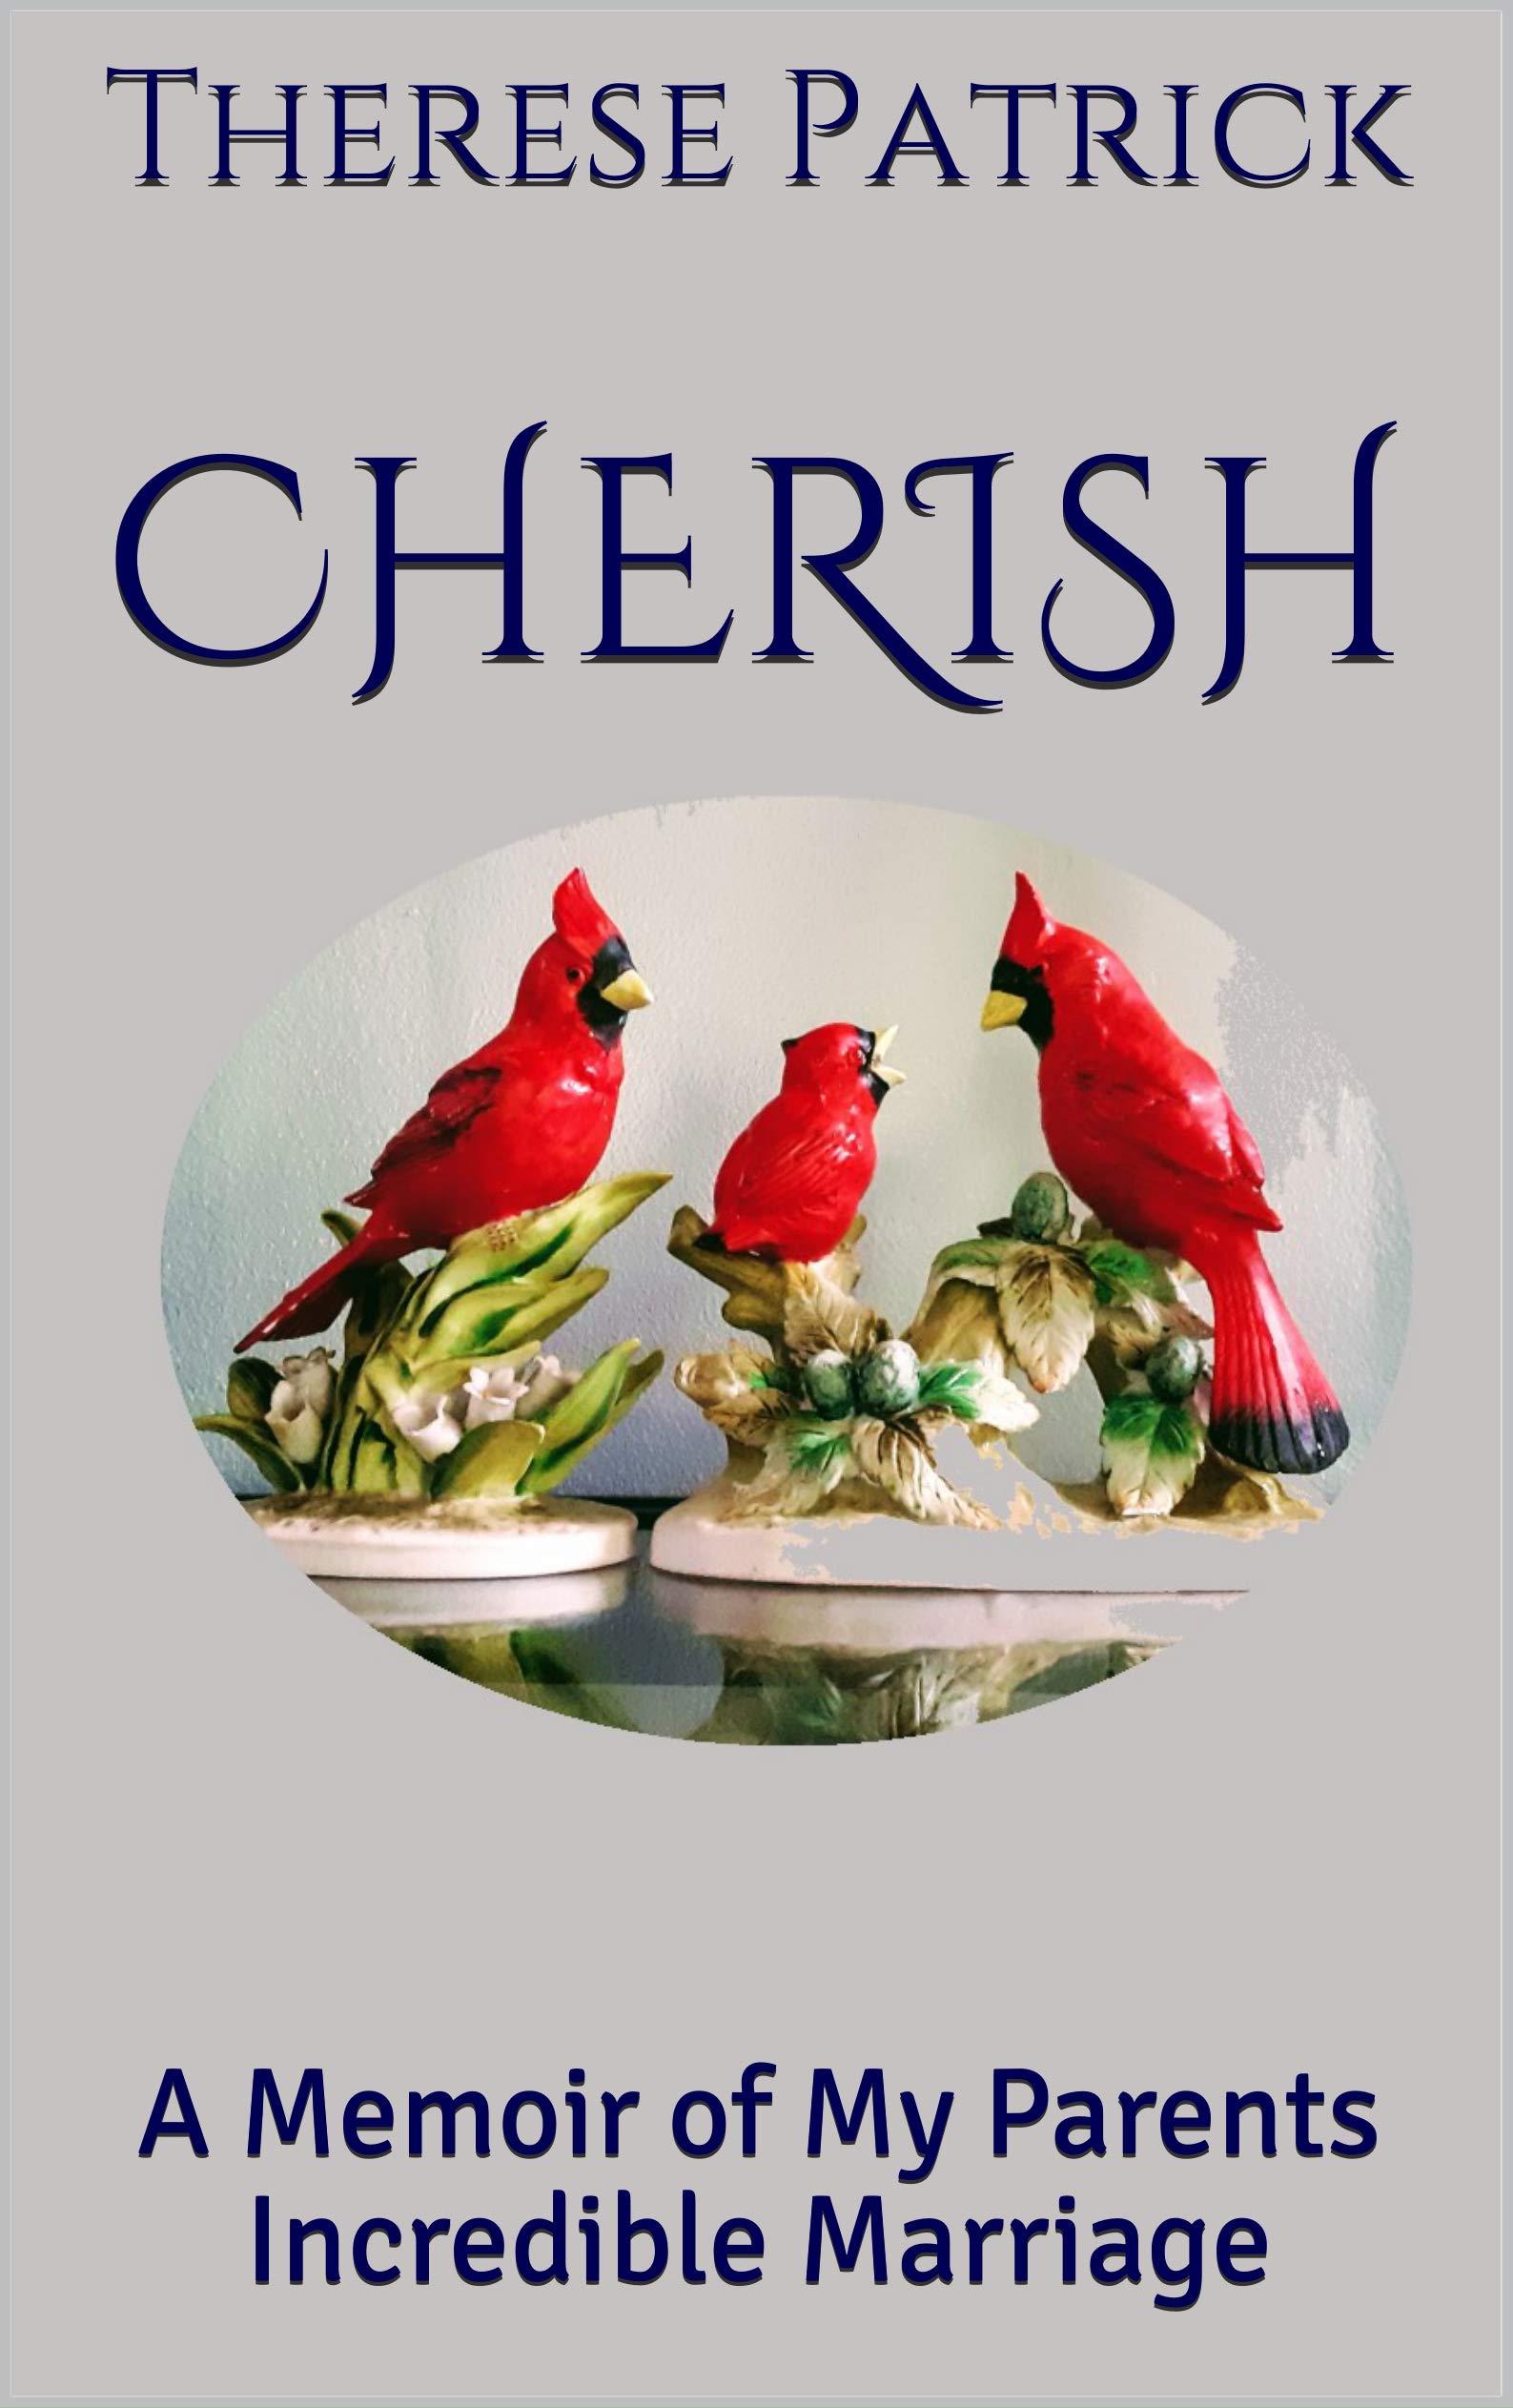 Cherish: A Memoir of My Parents Incredible Marriage